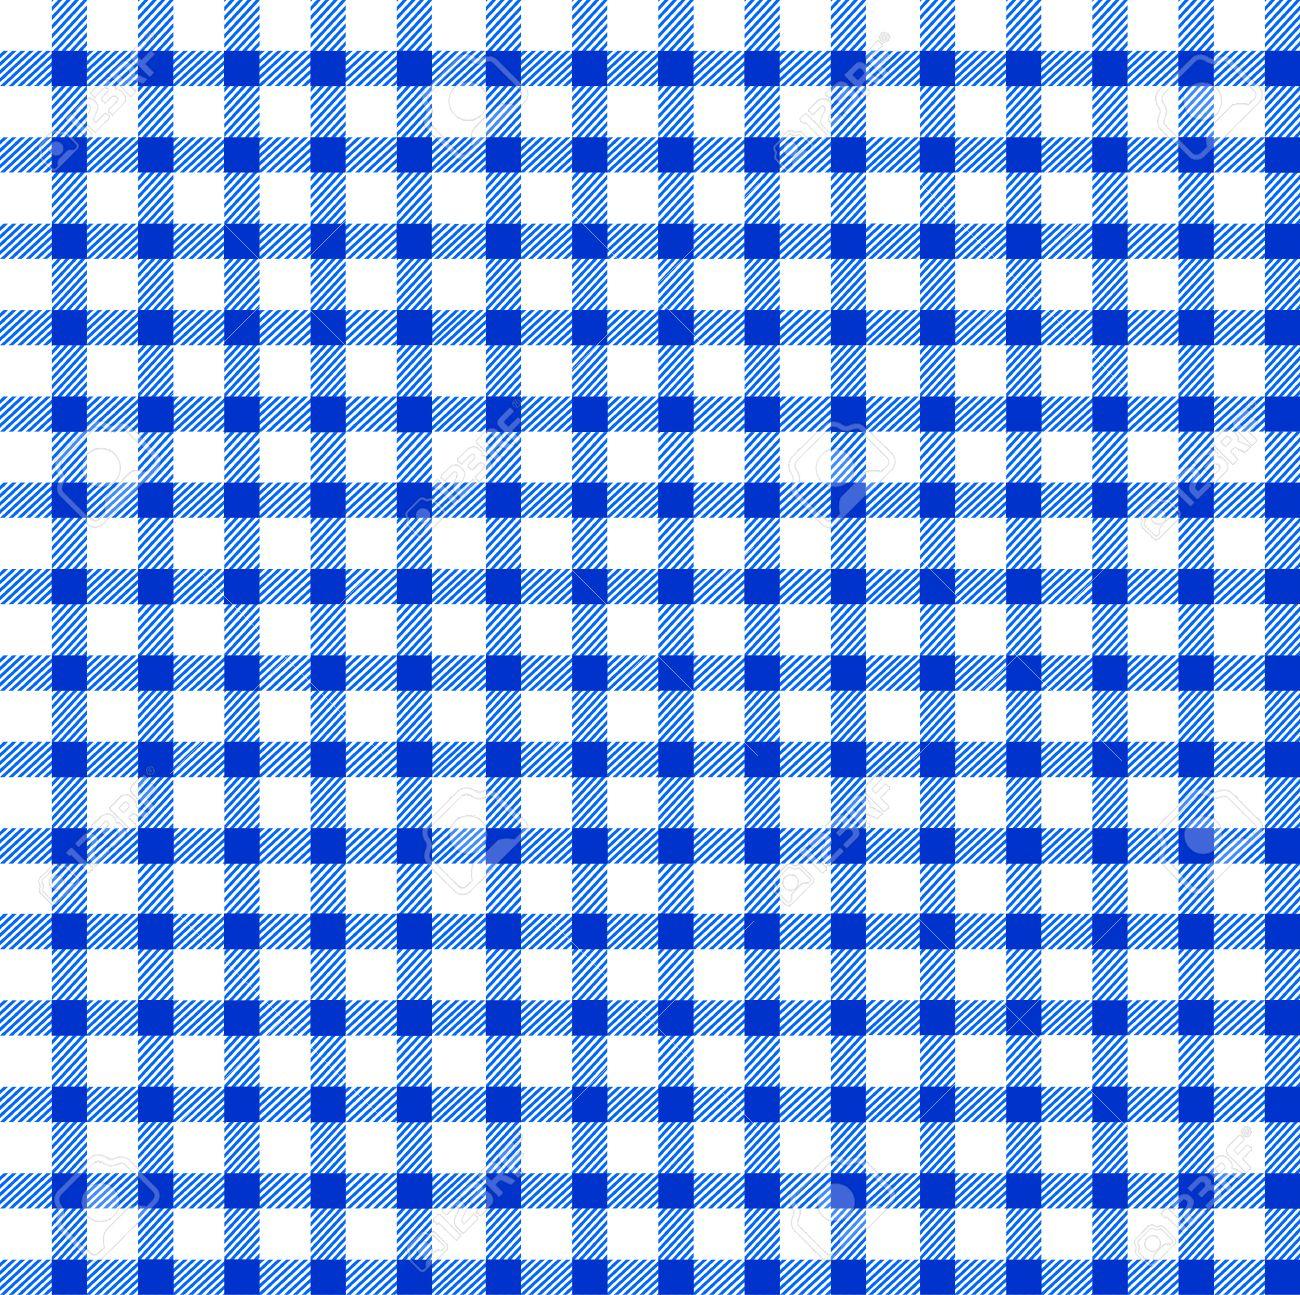 Beau Seamless Retro White Blue Square Tablecloth Stock Vector   17302205